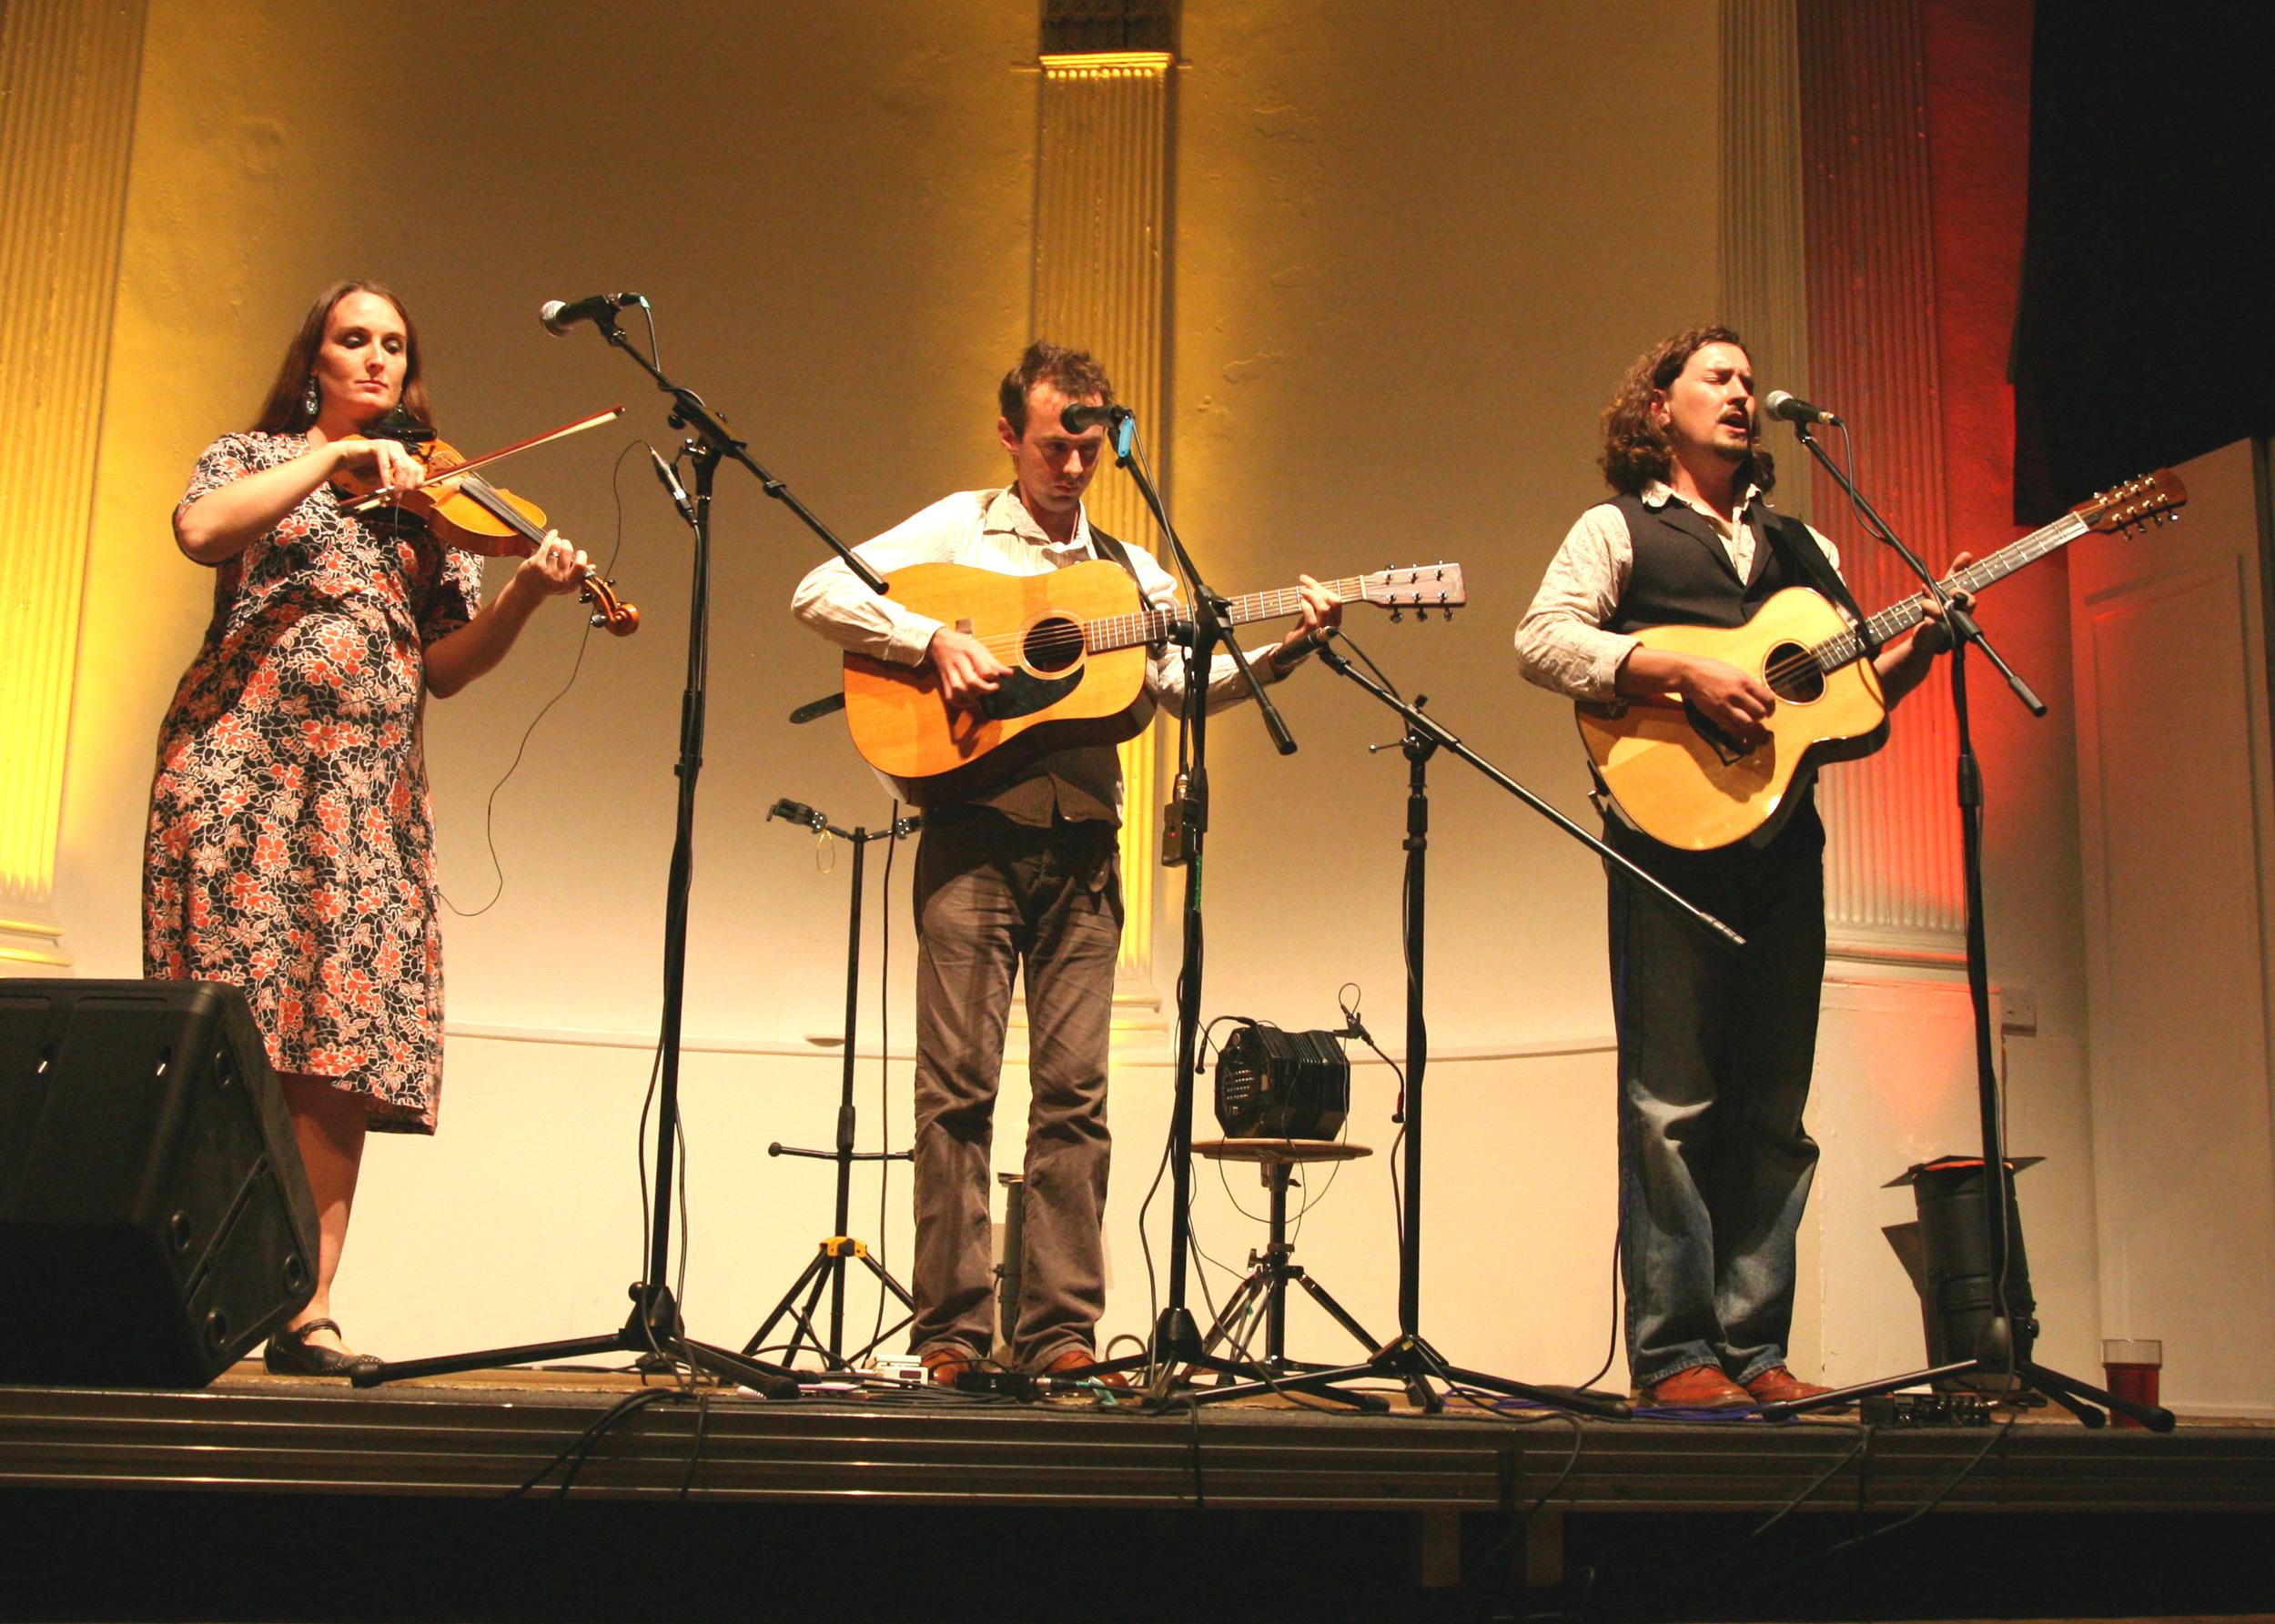 Nancy Kerr, James Fagan and Robert Habron